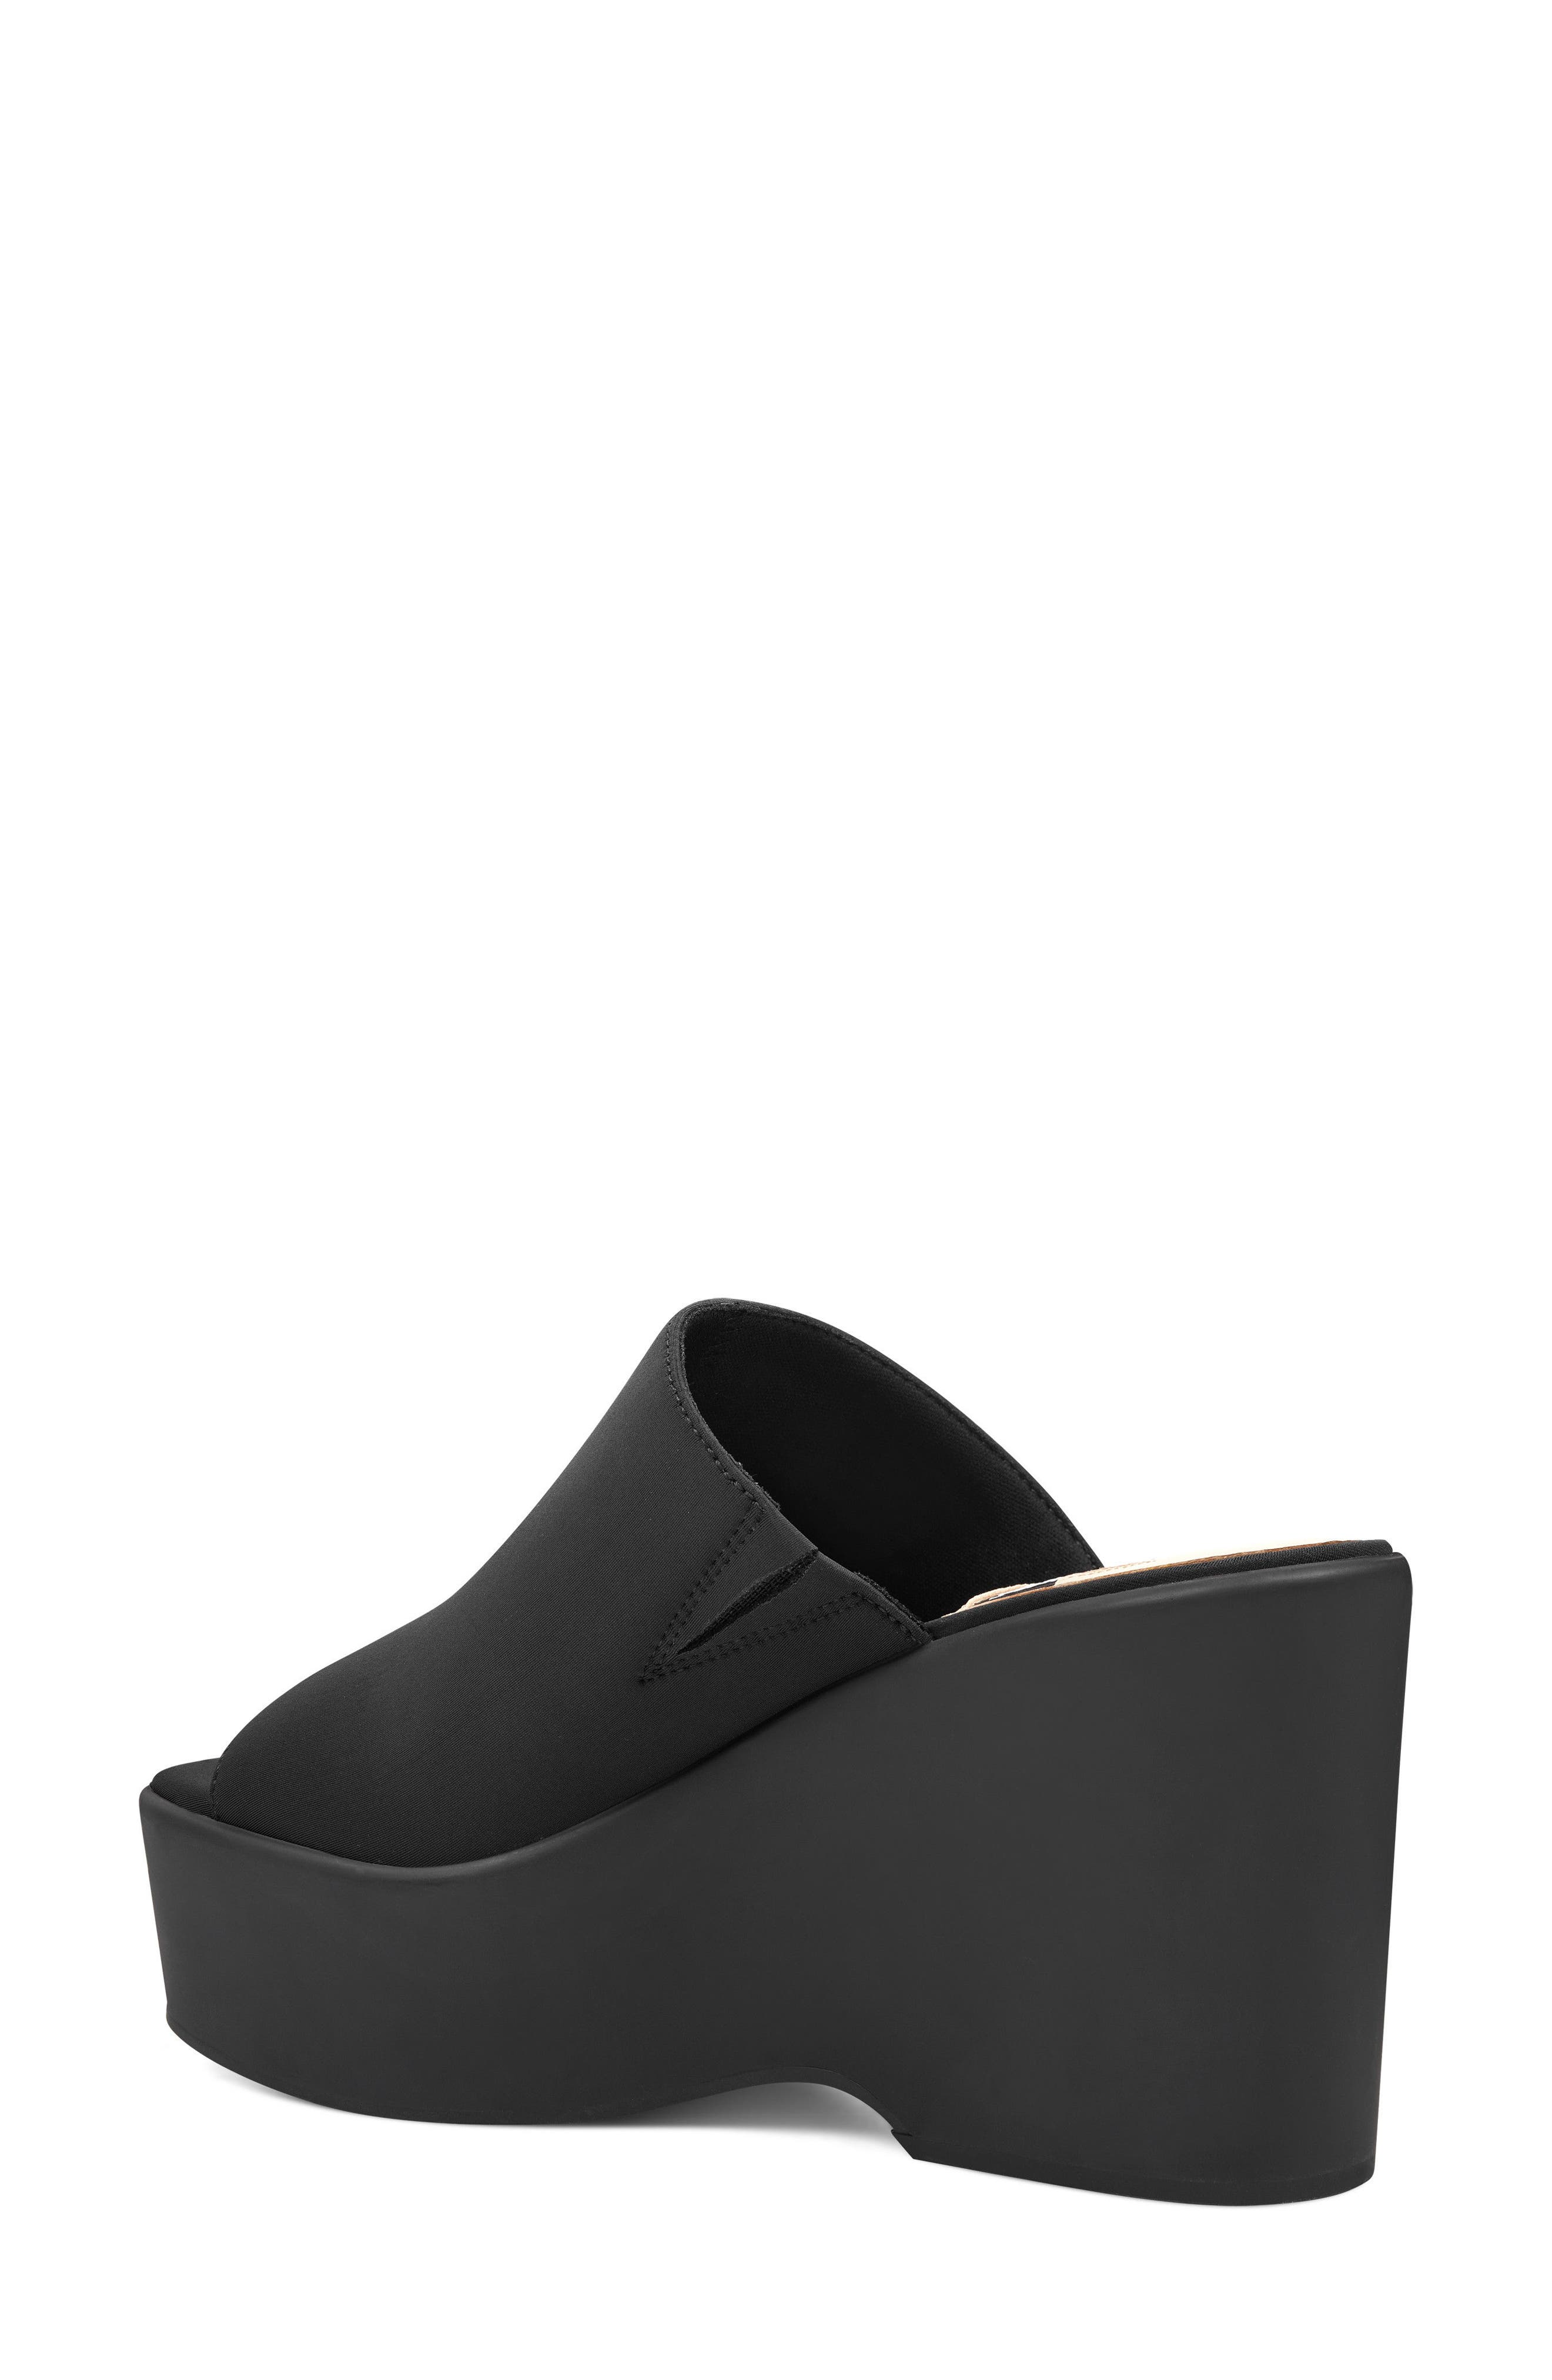 Tomo - 40th Anniversary Capsule Collection Platform Sandal,                             Alternate thumbnail 2, color,                             BLACK FABRIC